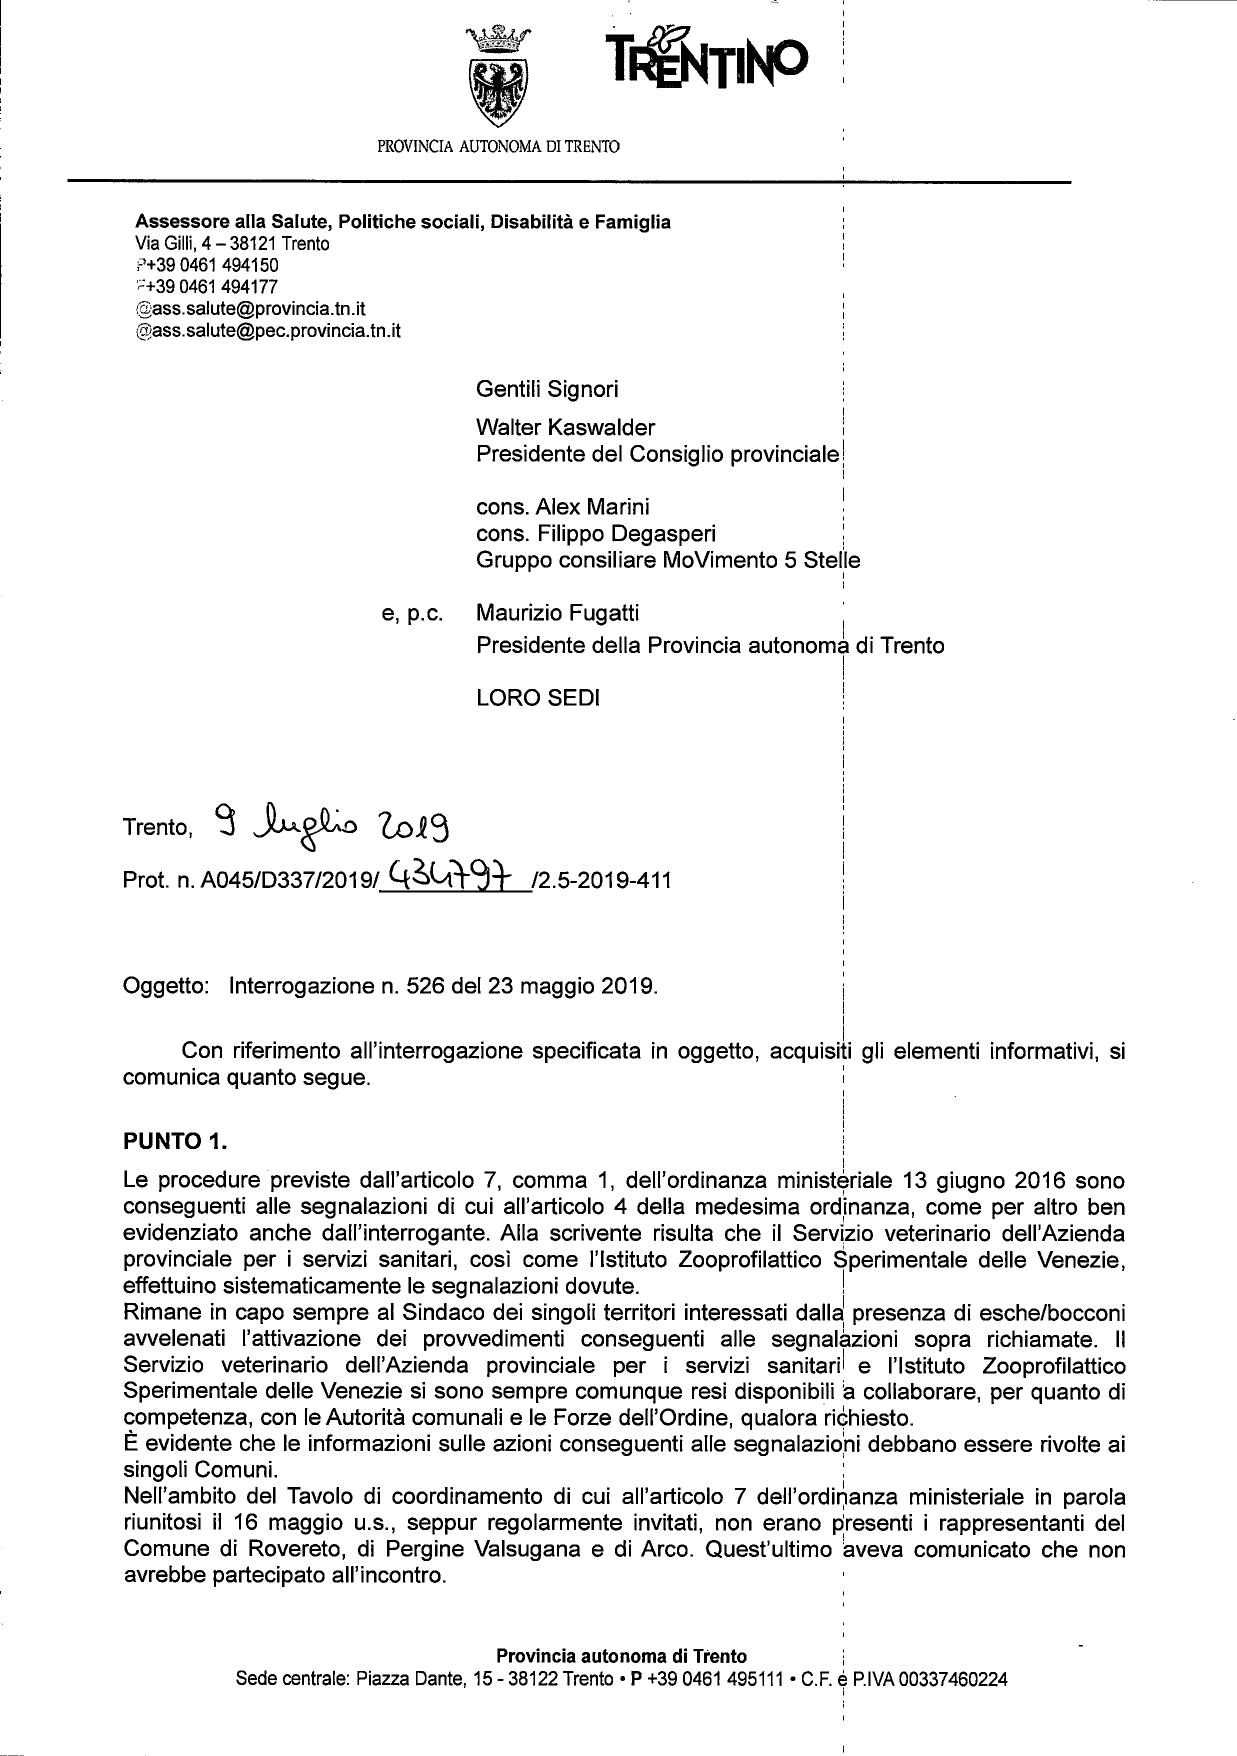 20190709_risposta bocconi avvelenati (1)